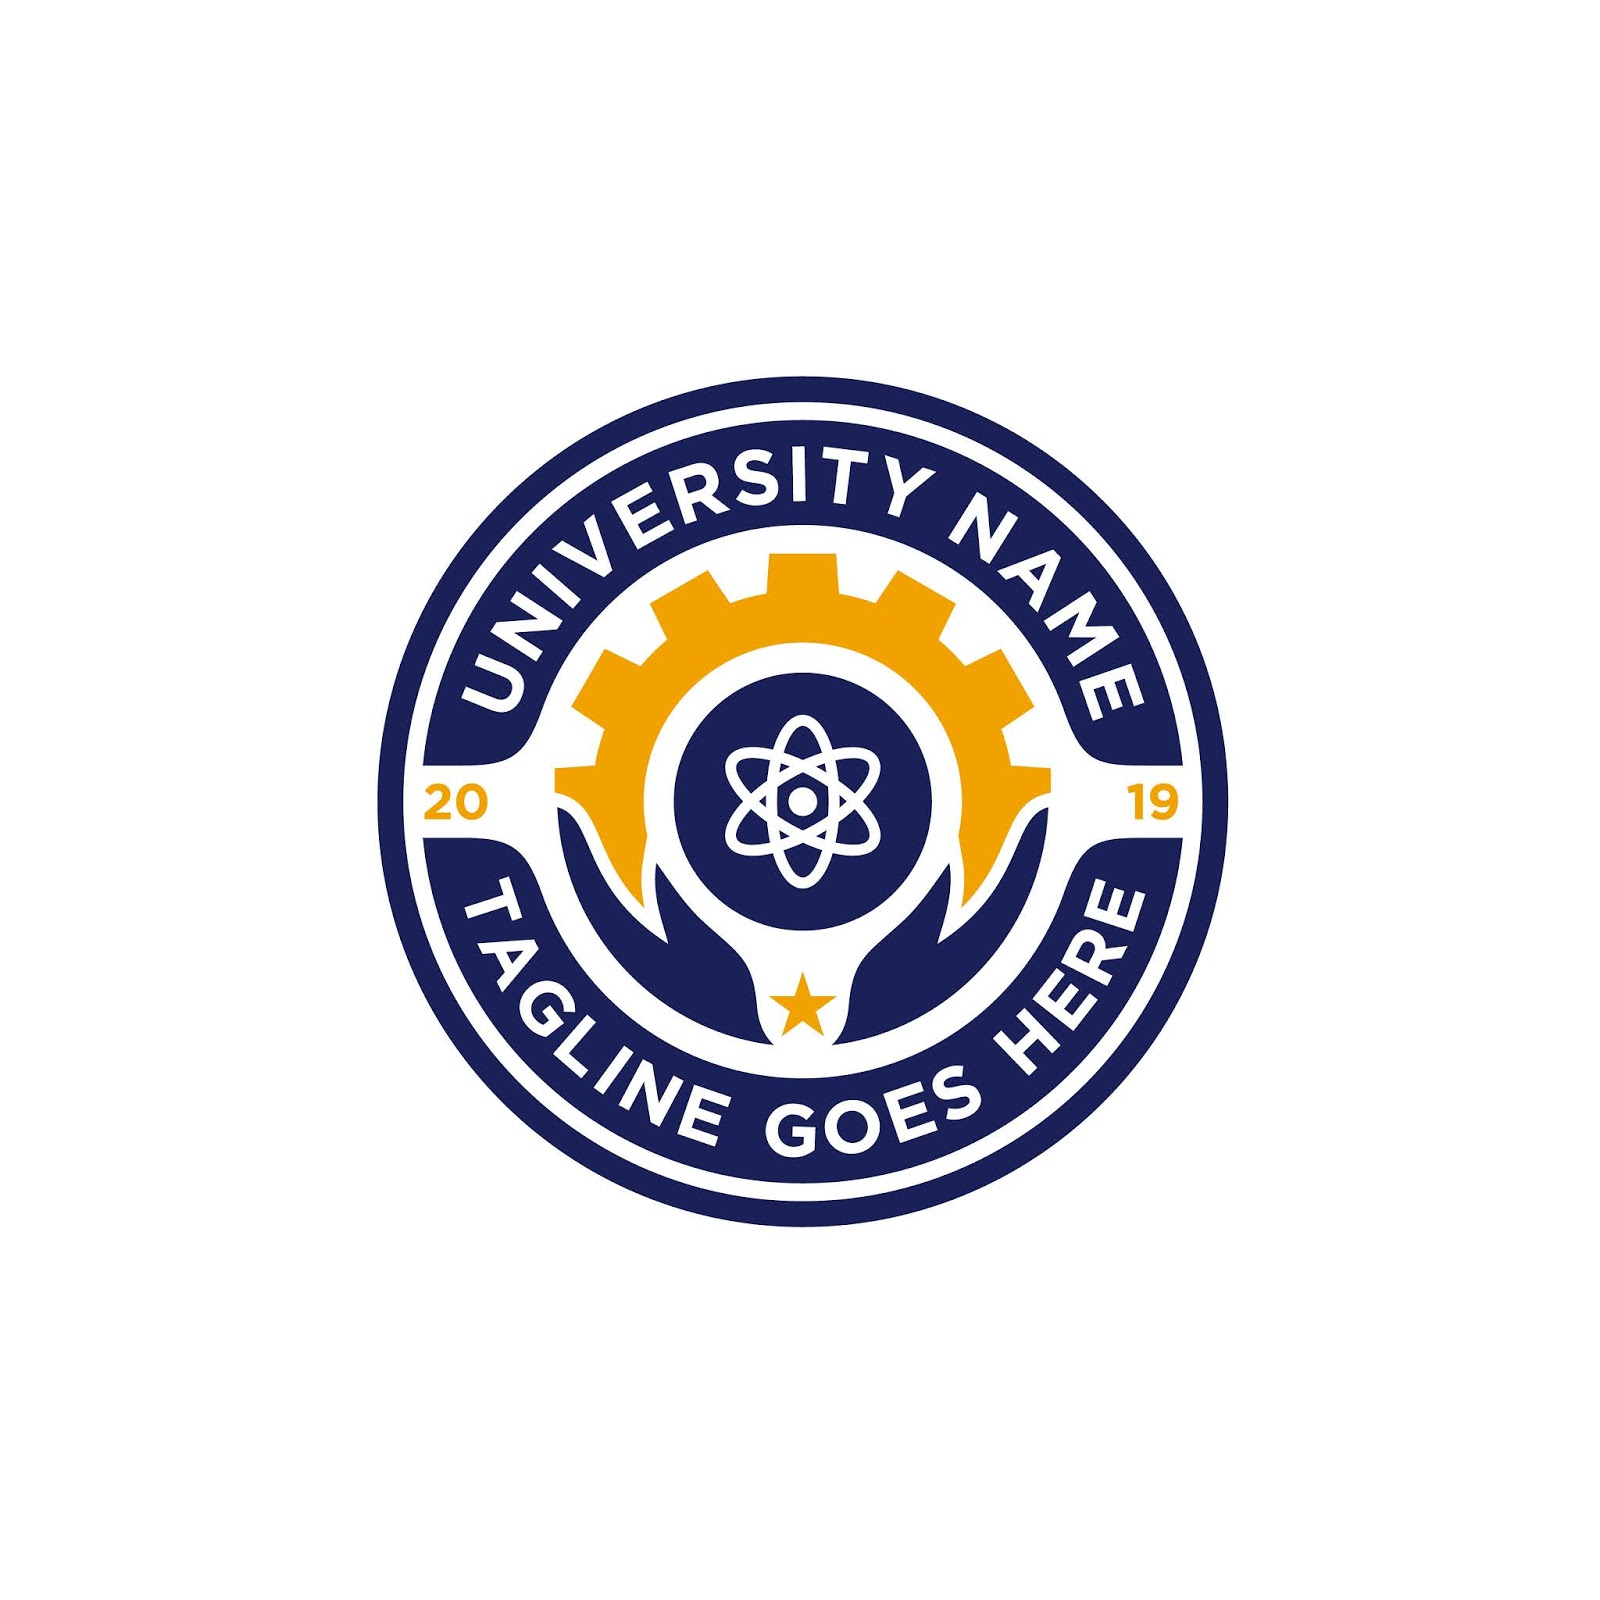 School Emblem Logo Design Inspiration Free Download Vector CDR, AI, EPS and PNG Formats